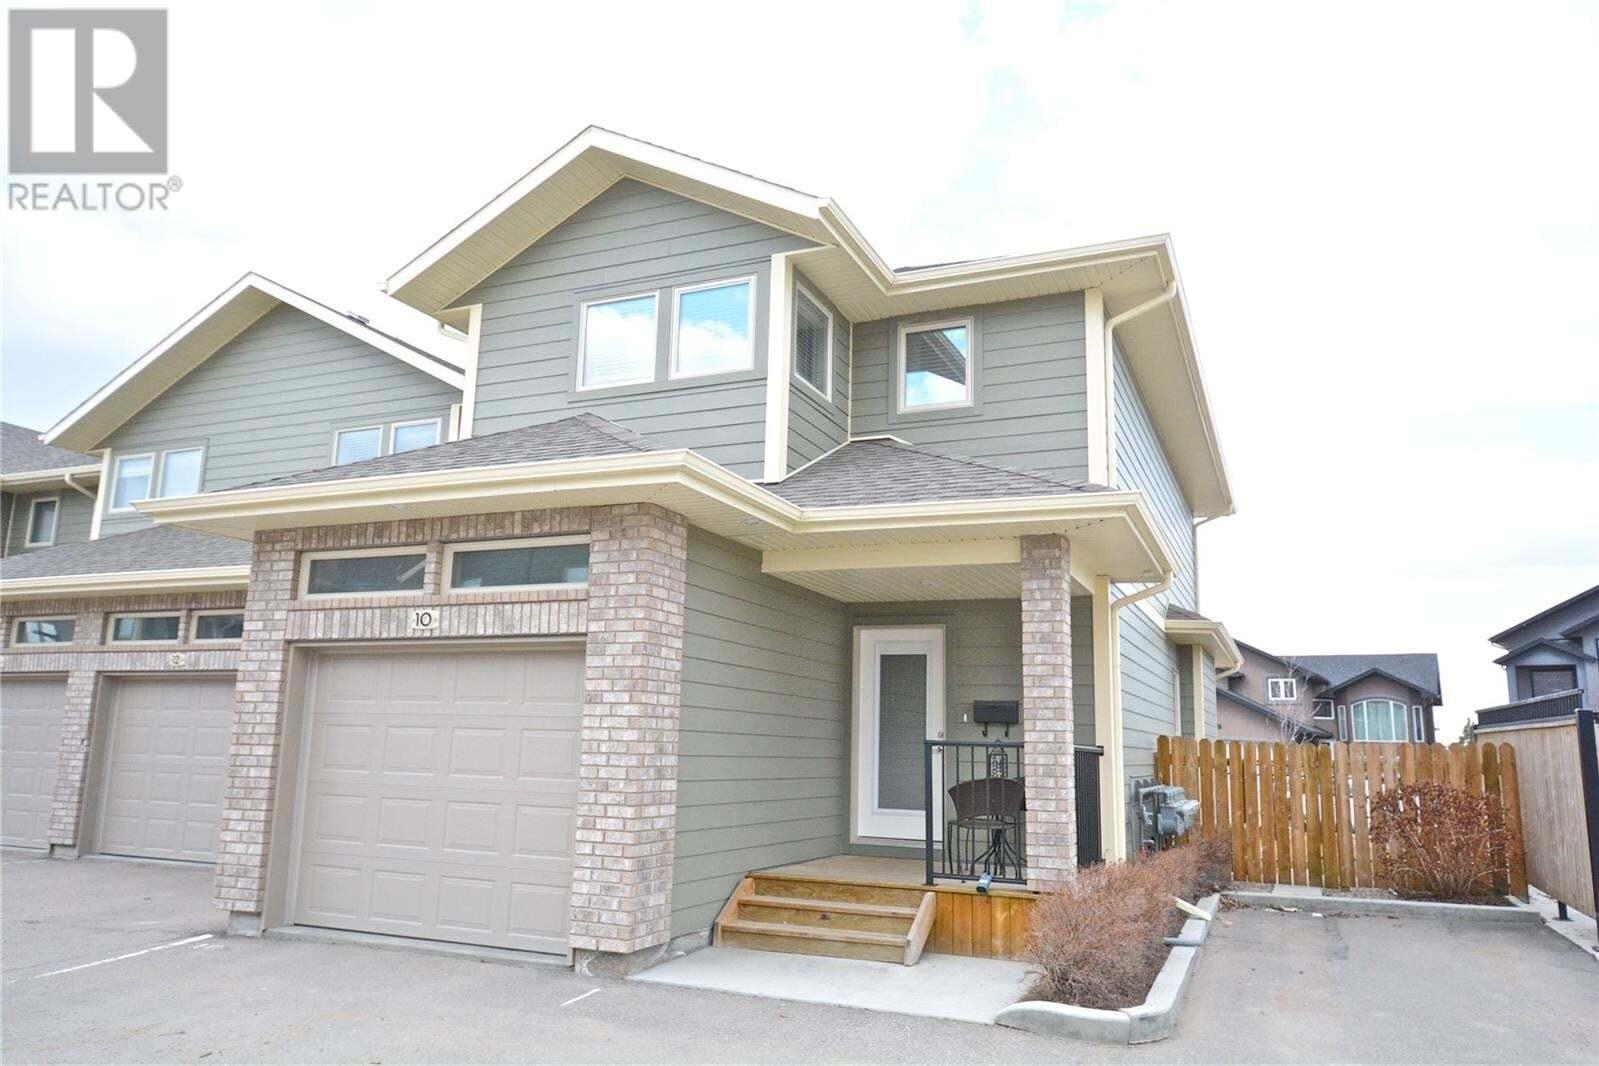 Townhouse for sale at 1550 Paton Cres Unit 10 Saskatoon Saskatchewan - MLS: SK814986